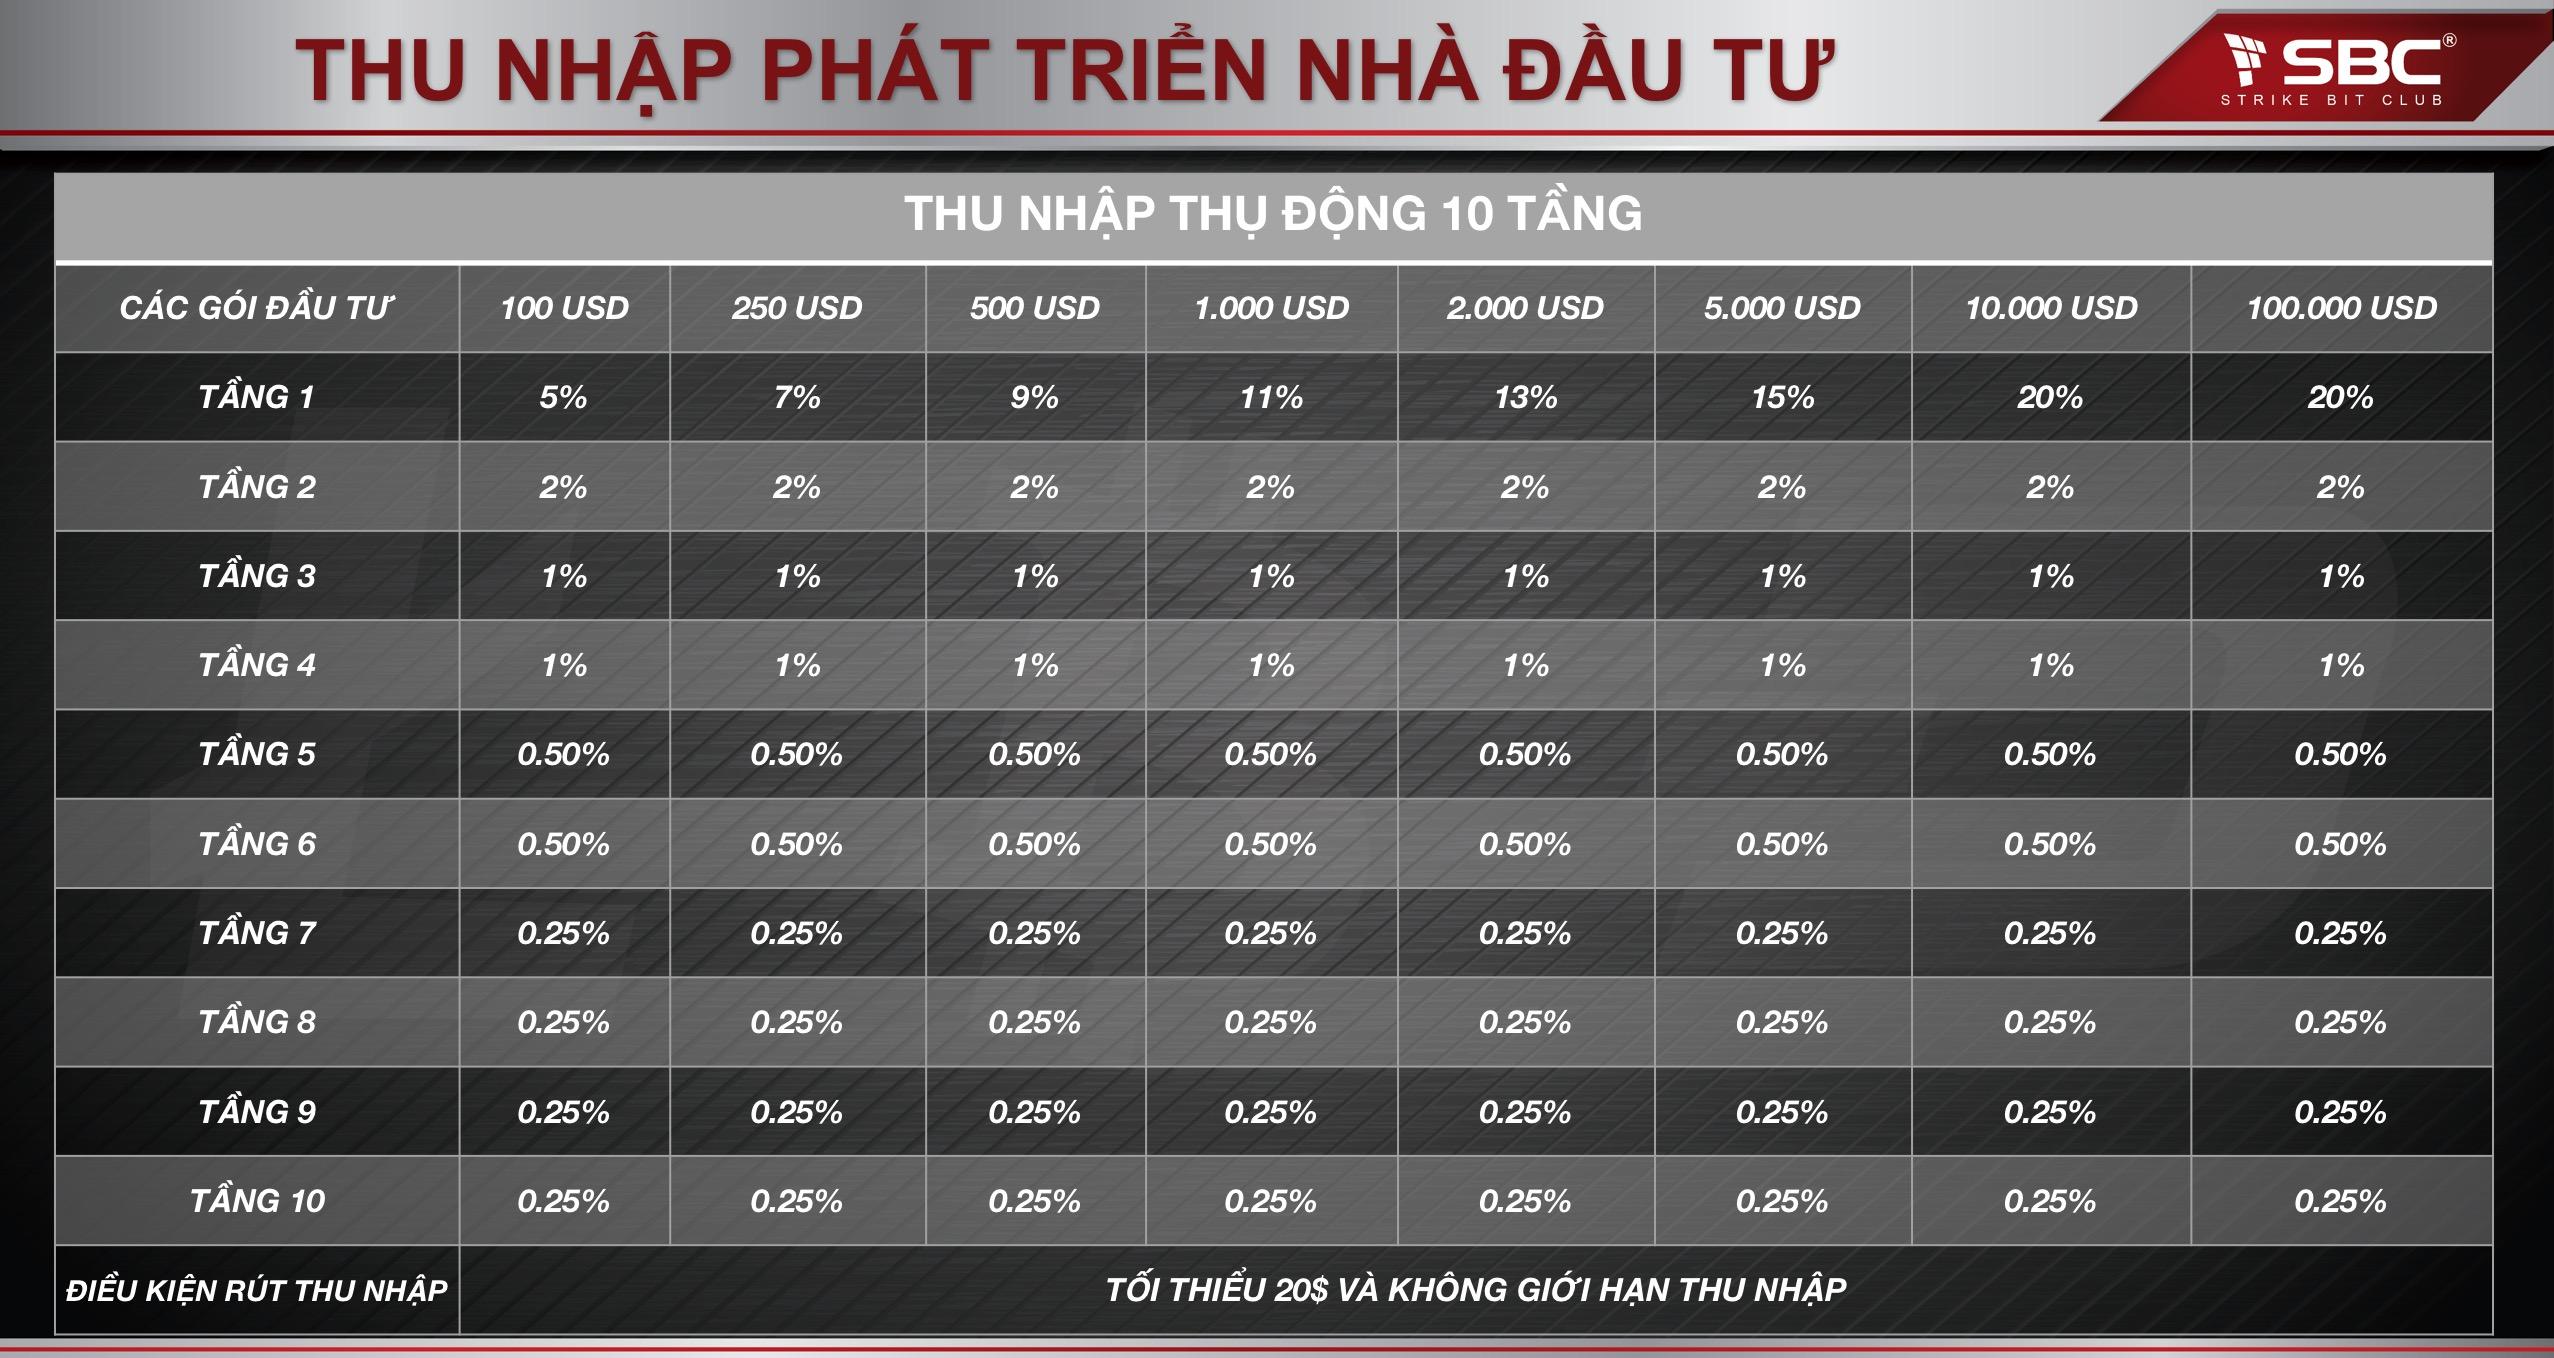 akinhdoanhthongminh.net_userfiles_image_thu_nhap_phat_trien_dau_tu_strike_bit_club.